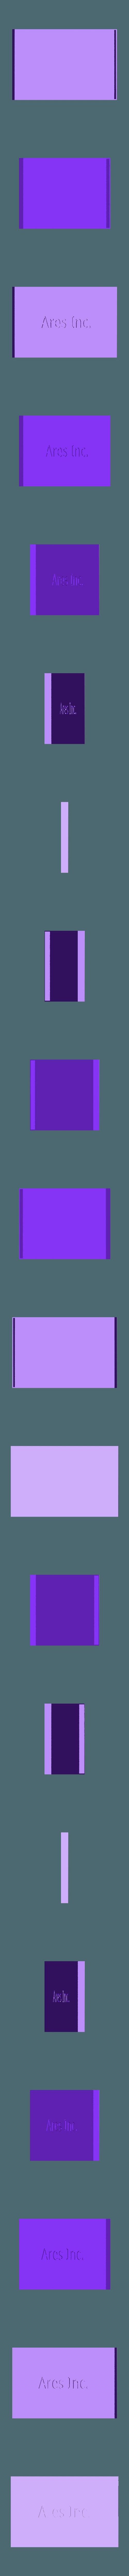 Nexus_Ops_-_Orange_Lid.stl Download free STL file Nexus Ops Insert Cases • 3D printing object, Hardcore3D